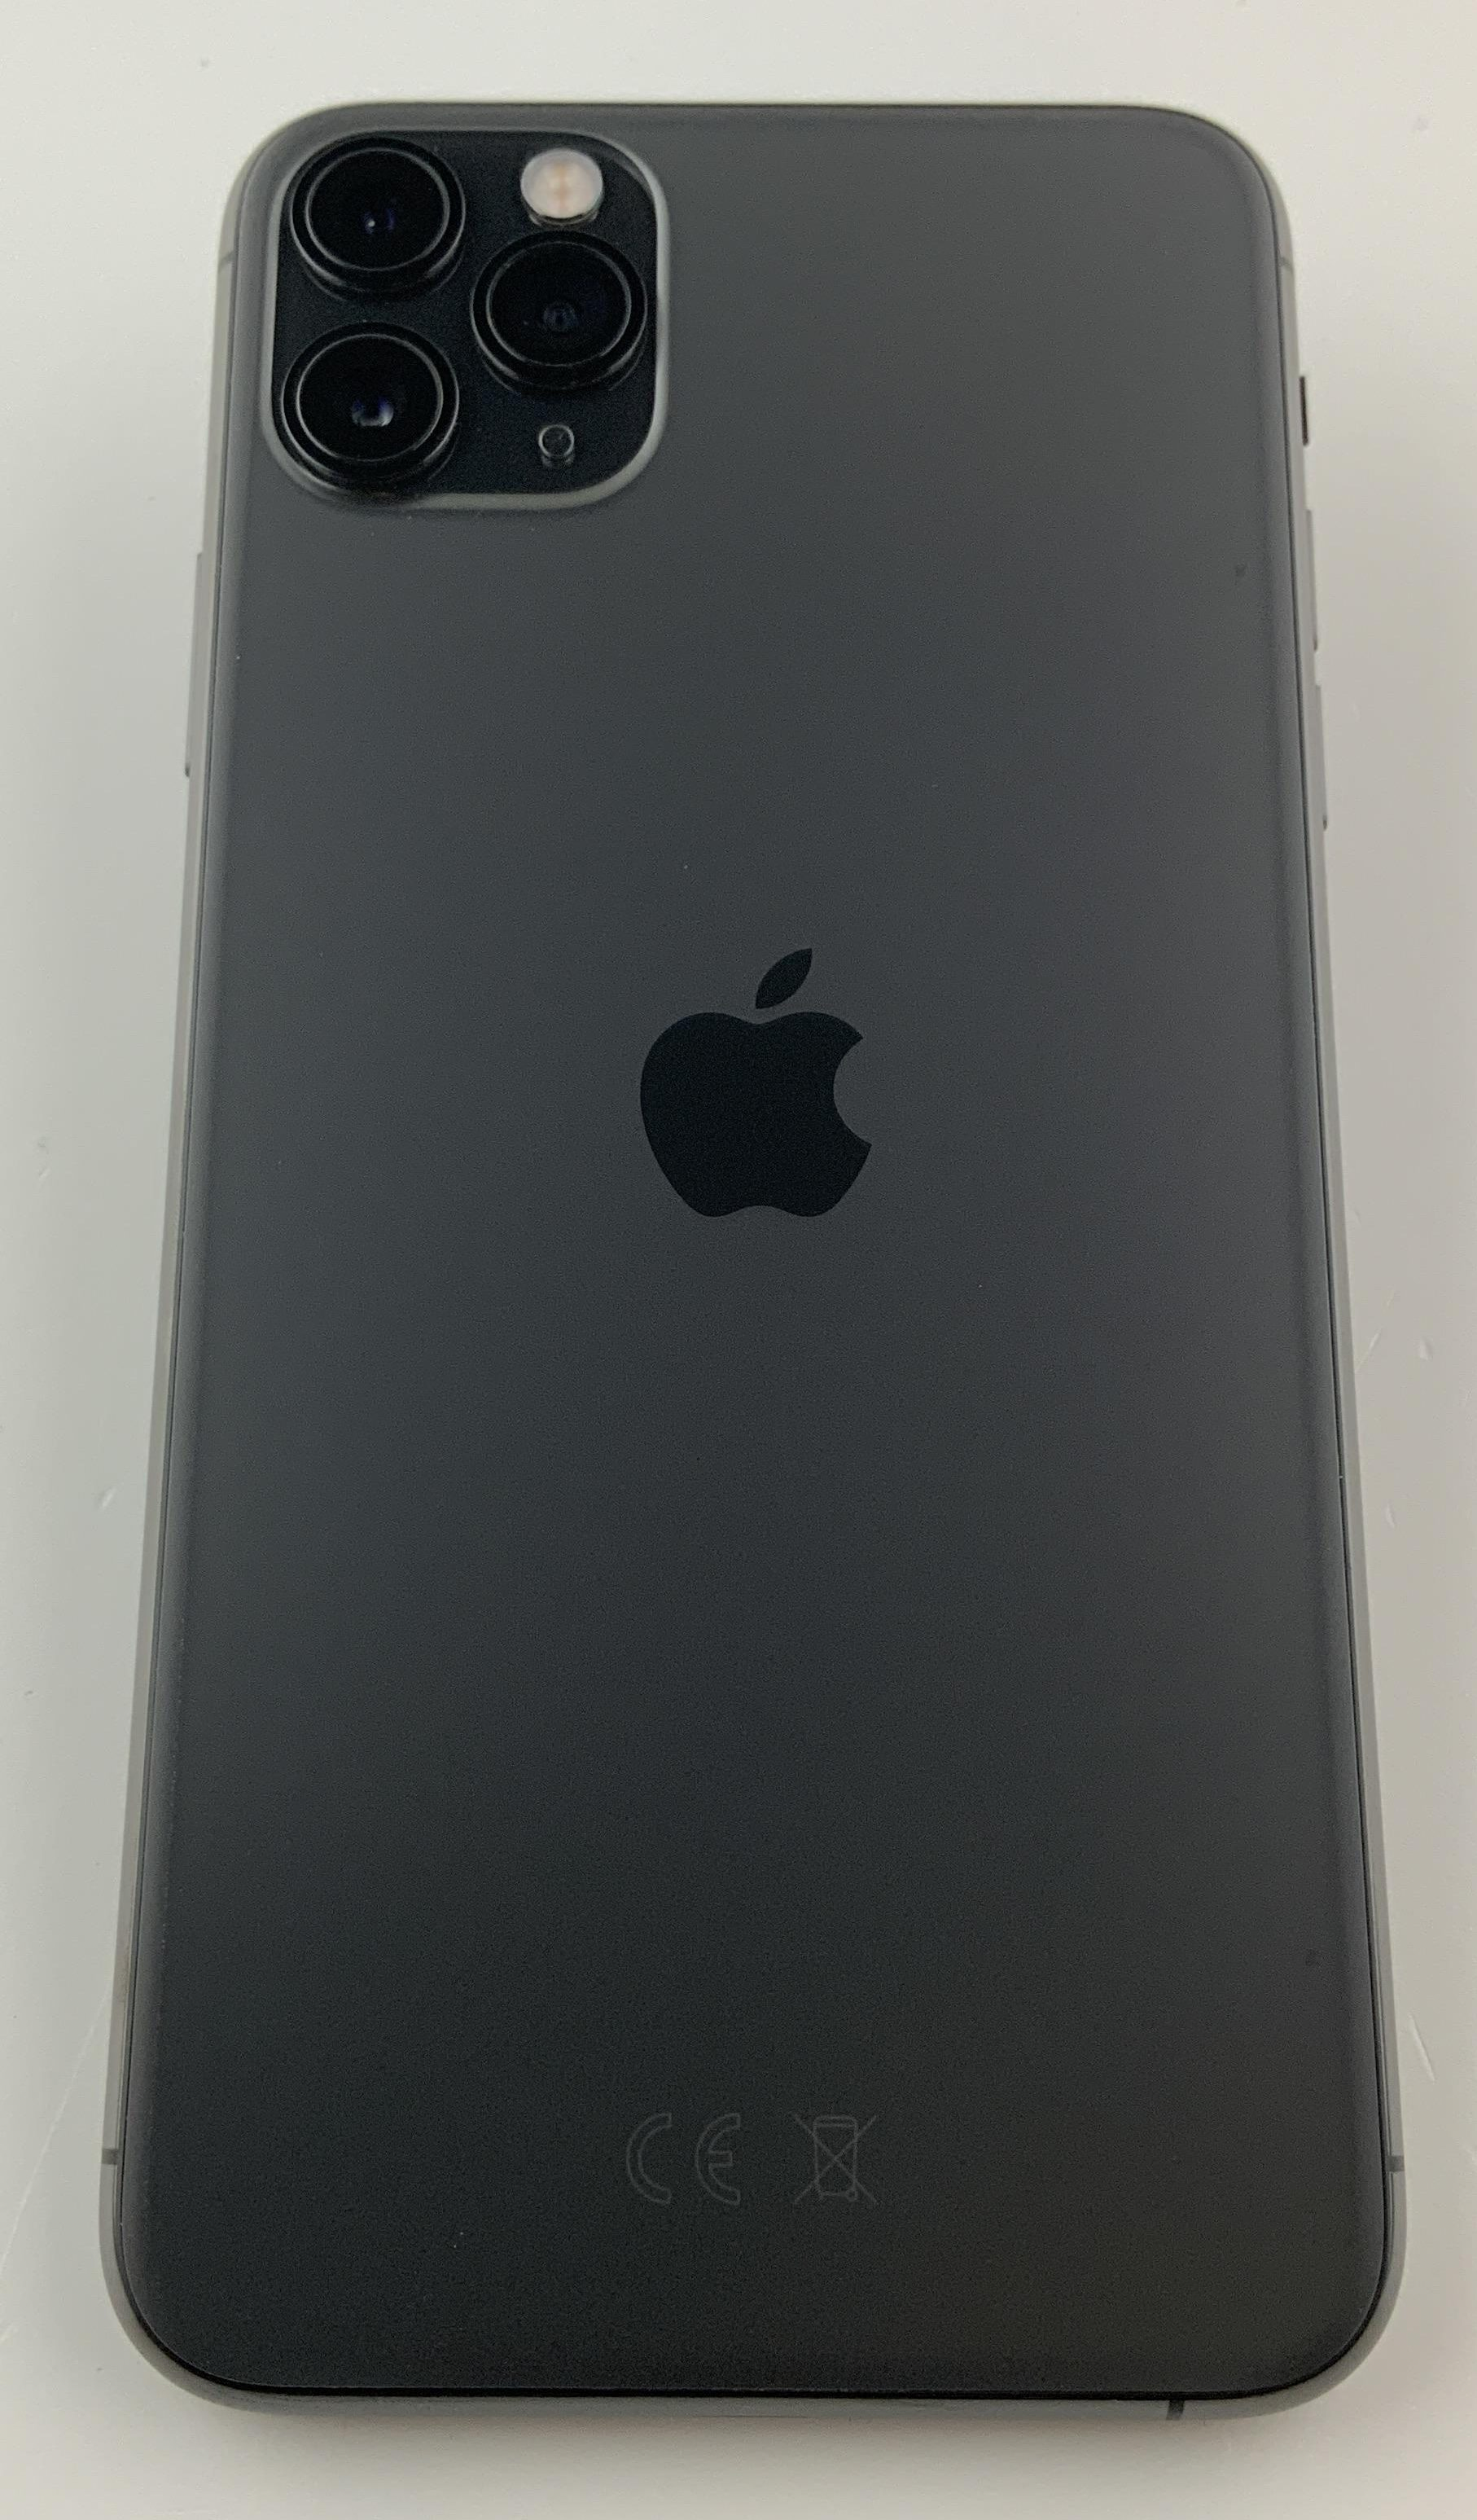 iPhone 11 Pro Max 64GB, 64GB, Space Gray, image 2